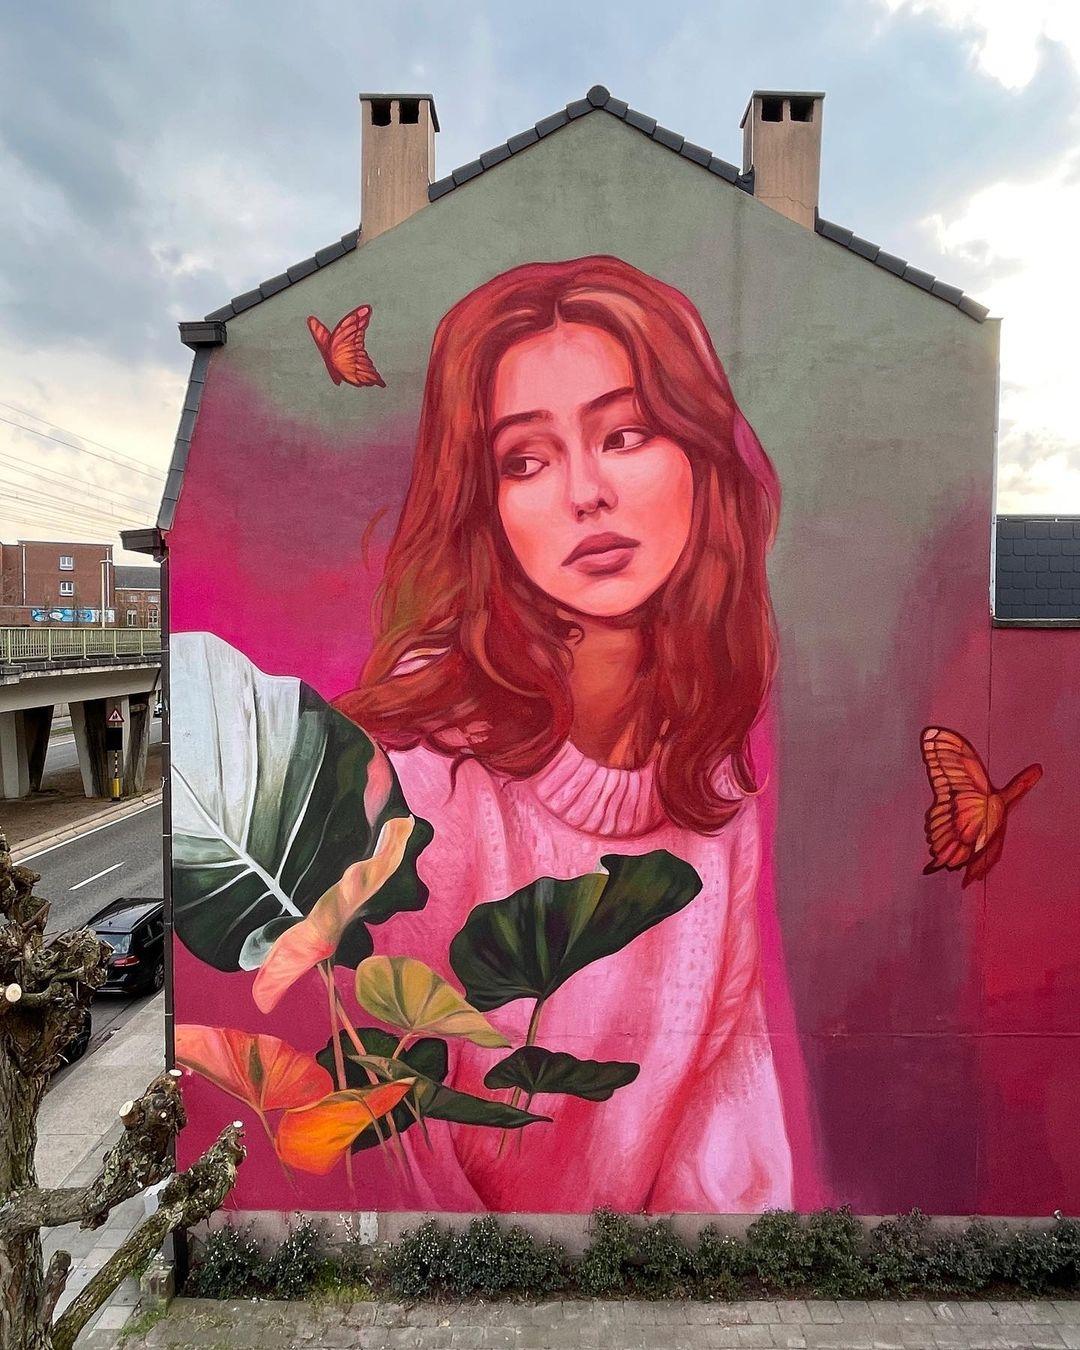 Kitsune @ Sint-Niklaas, Belgium